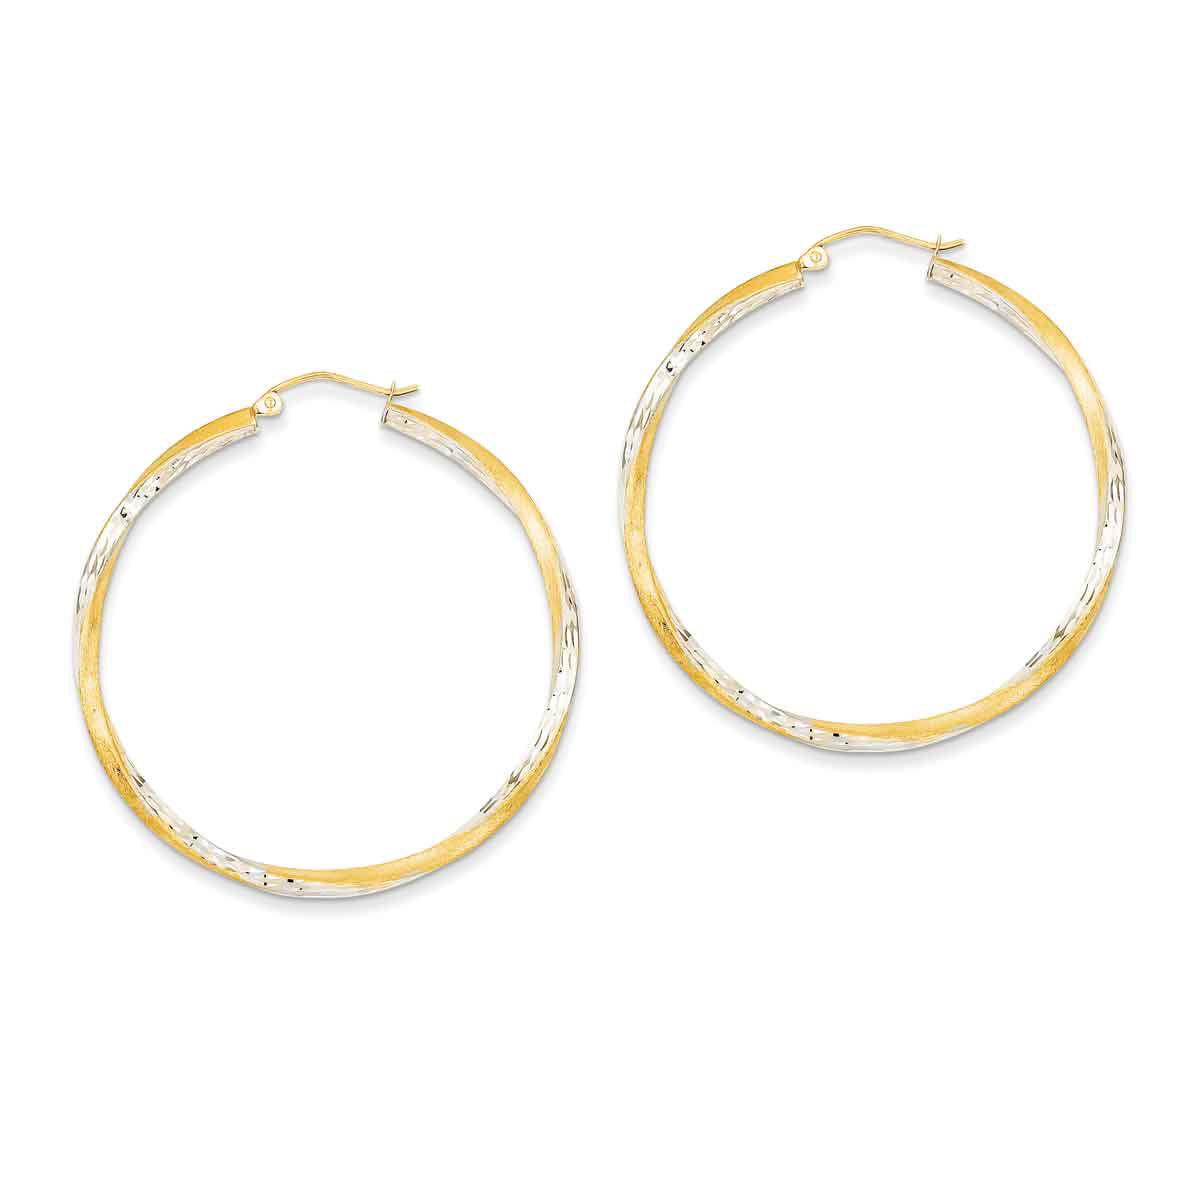 Jewelry Adviser 14k White Gold 2mm Square Tube Hoops